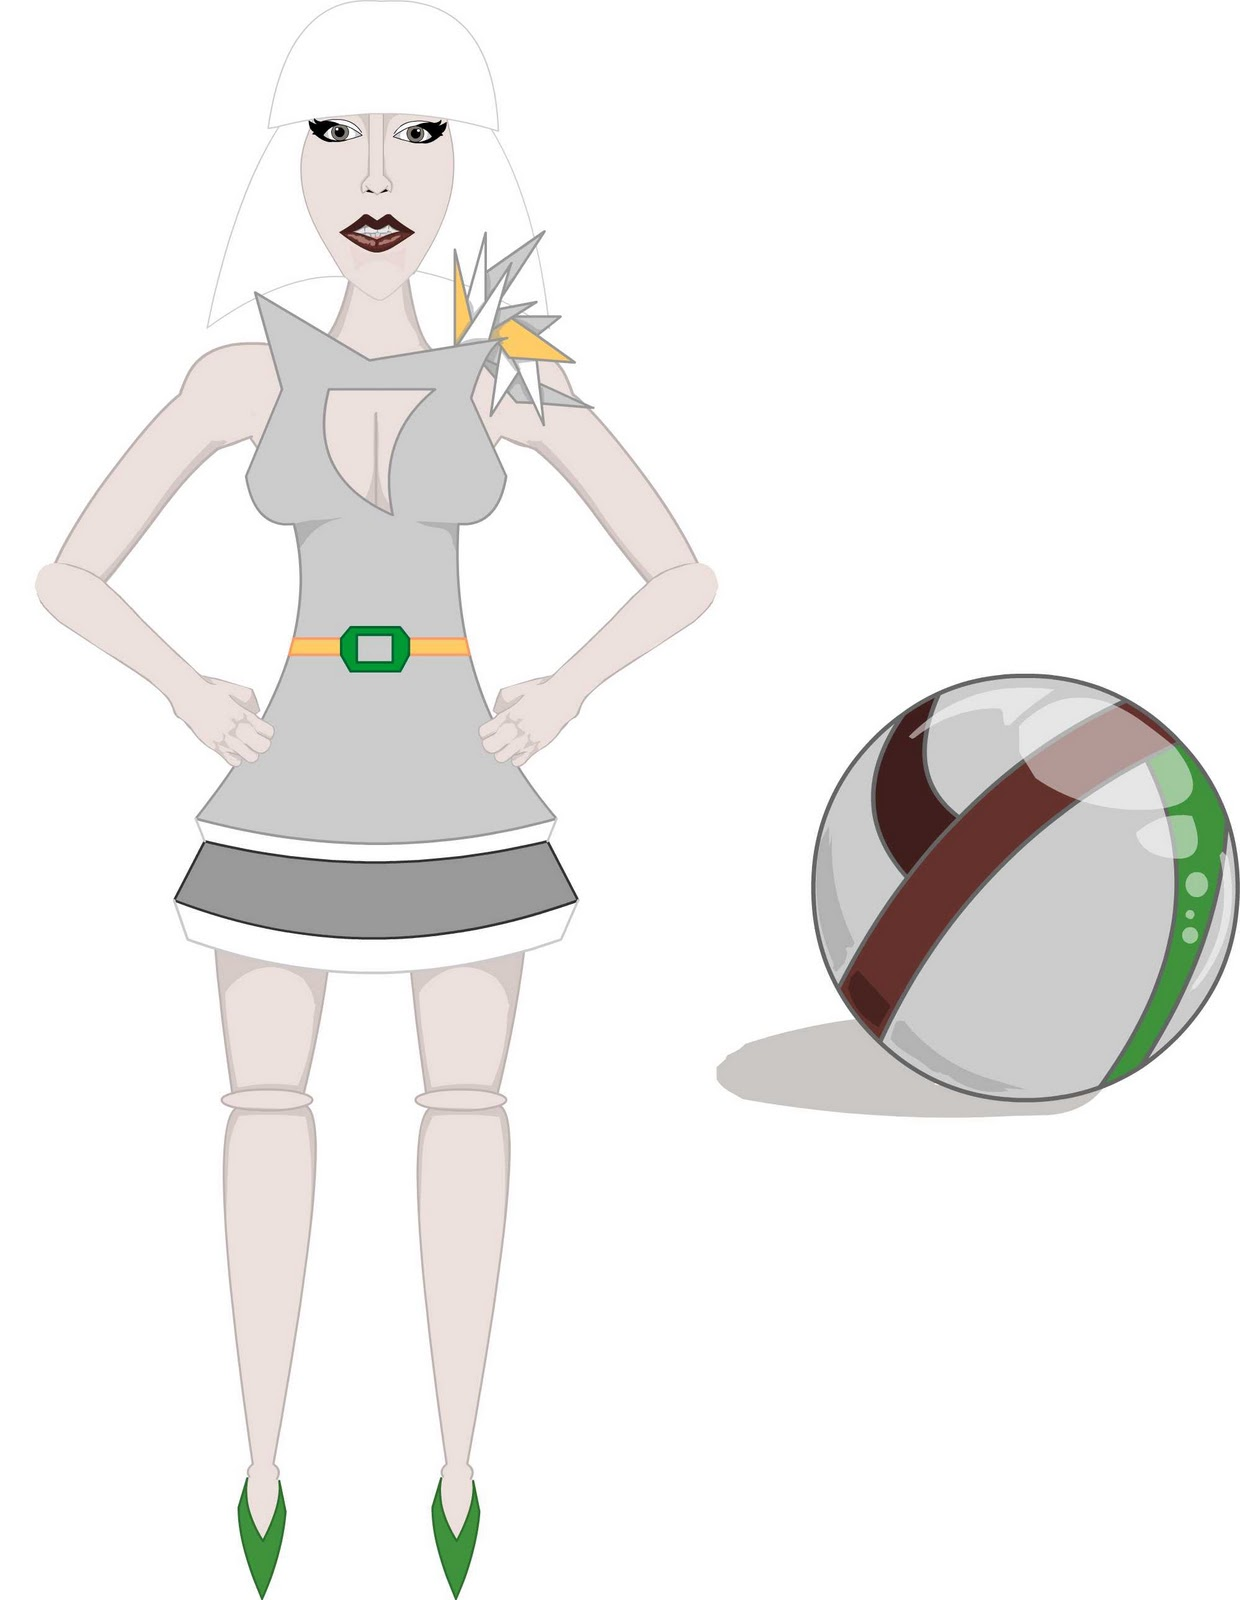 http://1.bp.blogspot.com/_wB6wnGEp758/TNNeQTC-EVI/AAAAAAAAAYI/hij6ikRQcqQ/s1600/Lady+Gaga+Character+Design.jpg